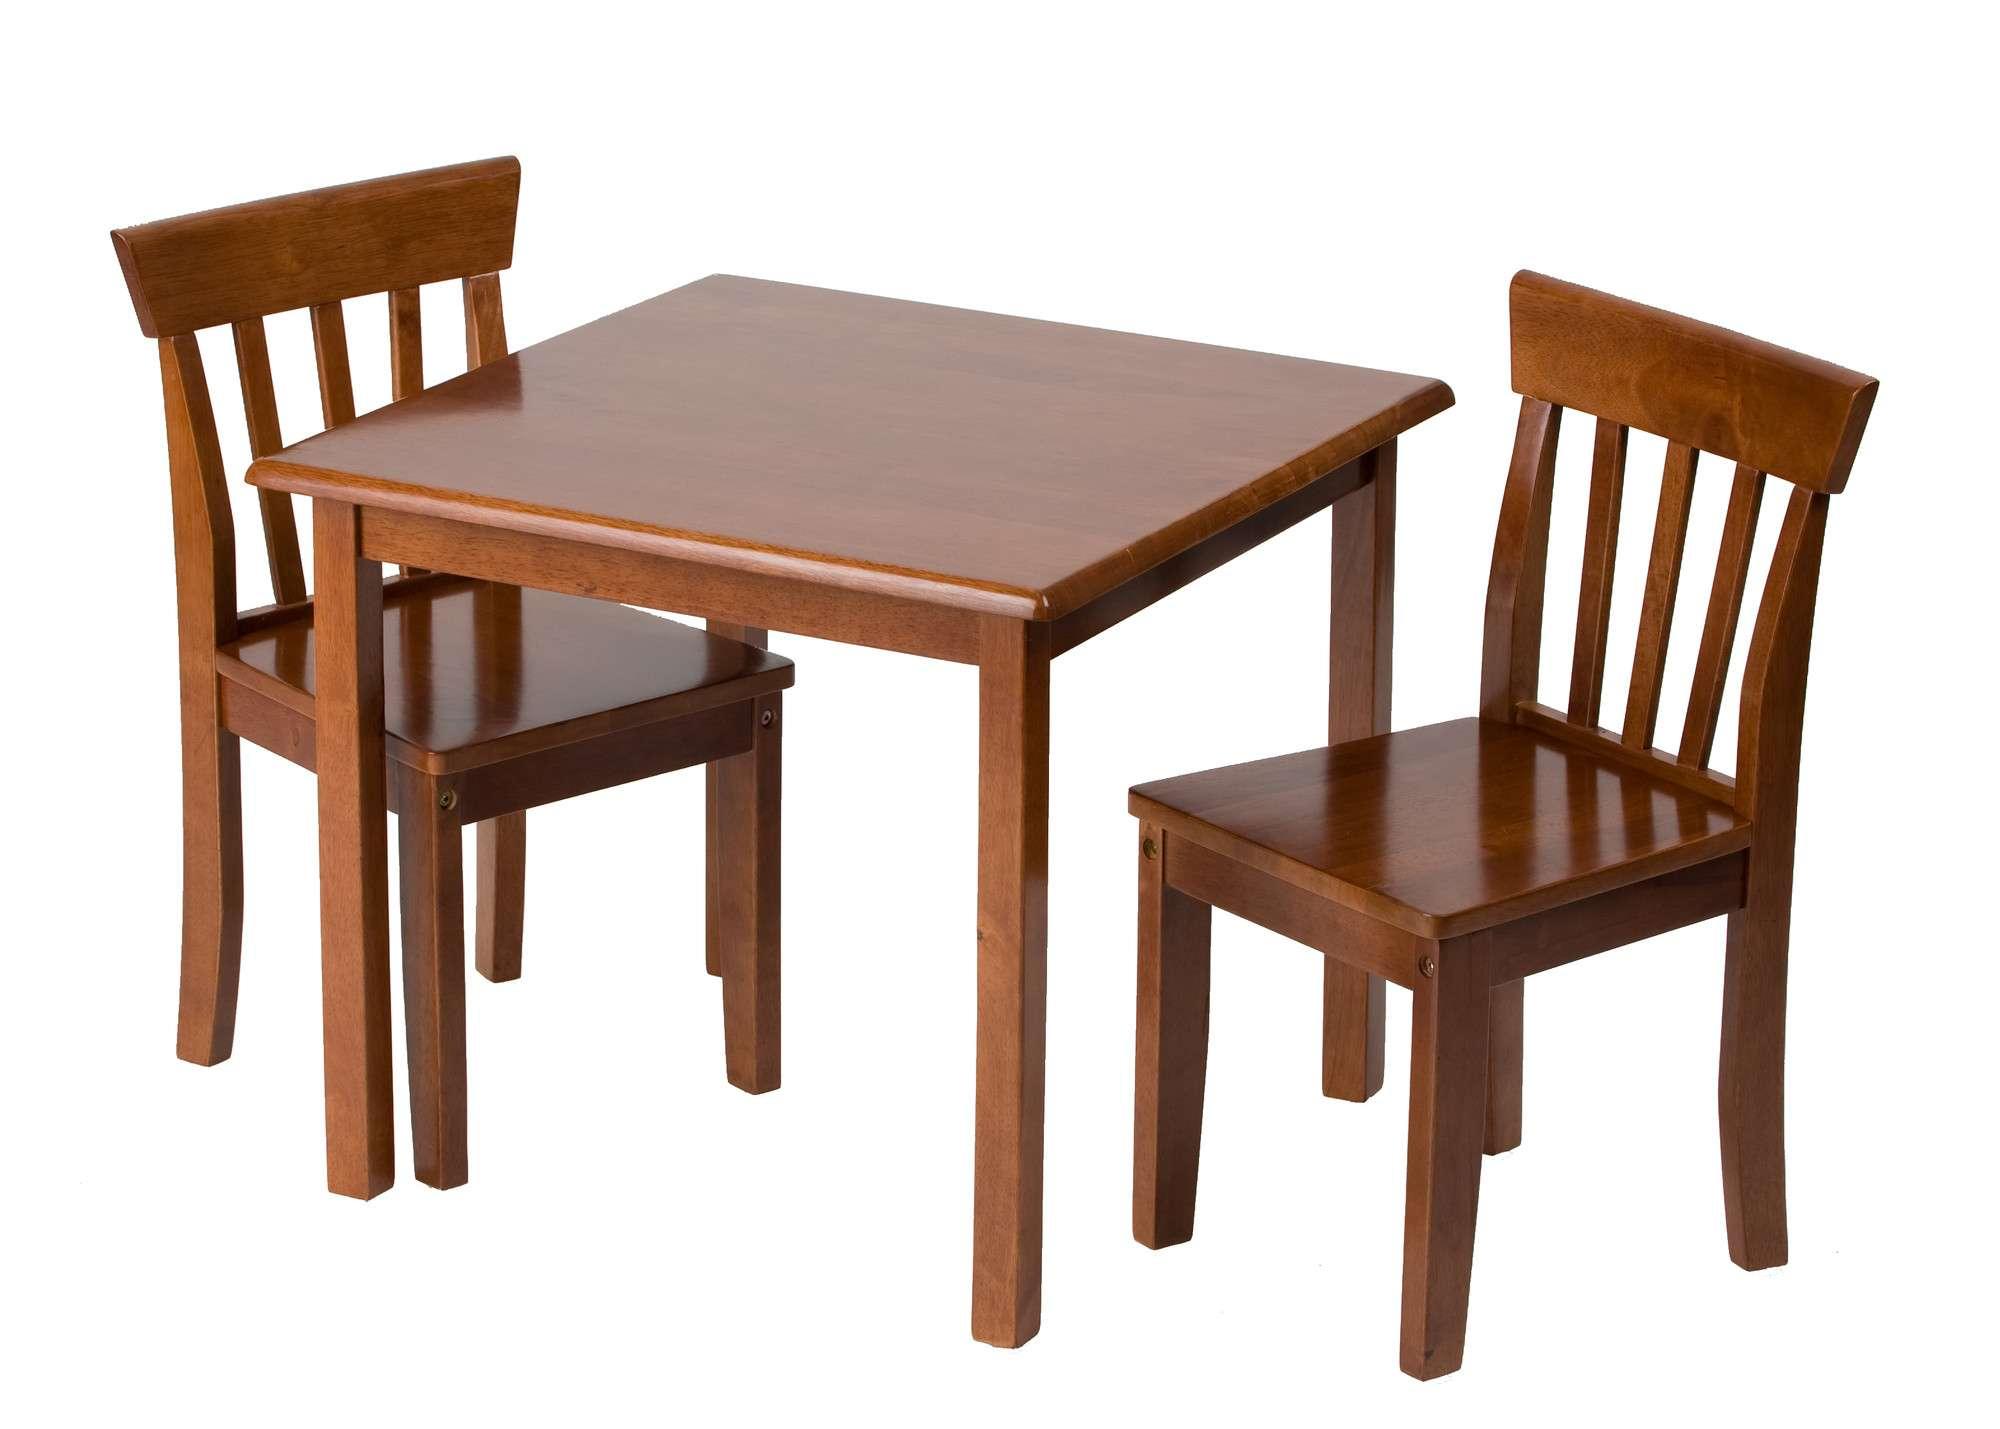 Mesa infantil color cereza 2 sillas estudio deluxe vv4 - Mesa estudio infantil ...